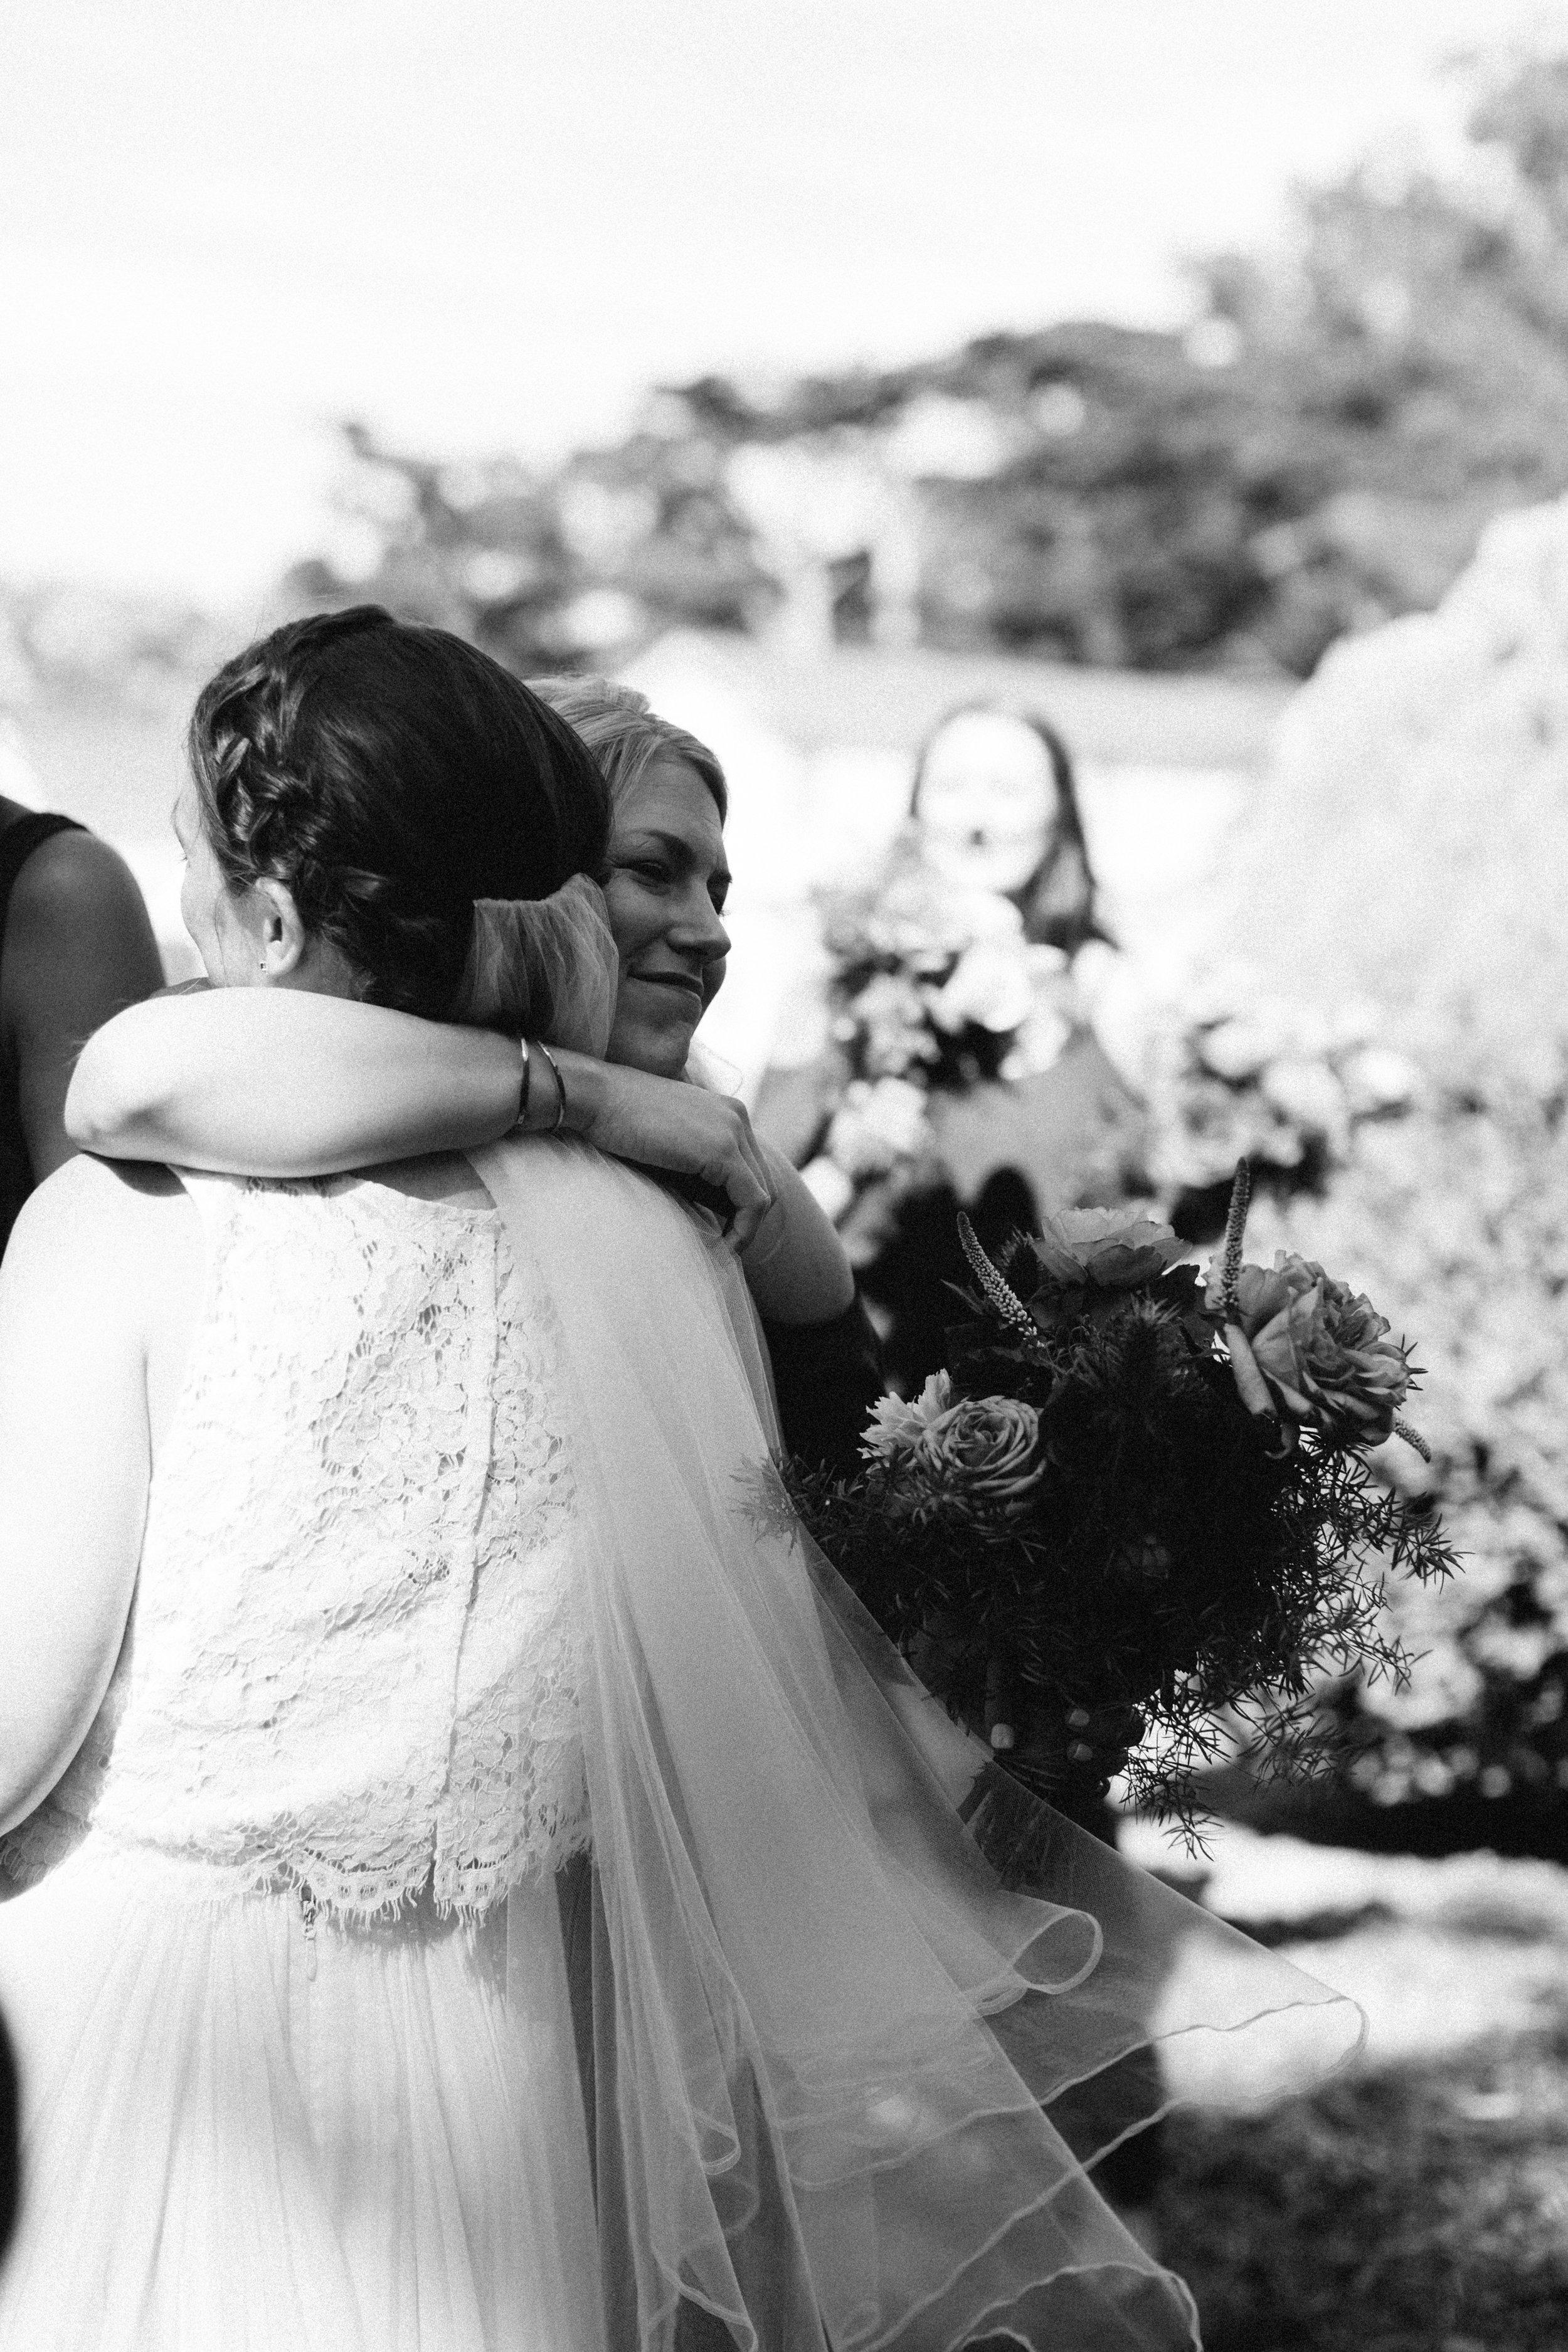 Tucker_Kristina_Wedding_Presidio_San_Francisco_Abigail_Malone_Photography-720.jpg